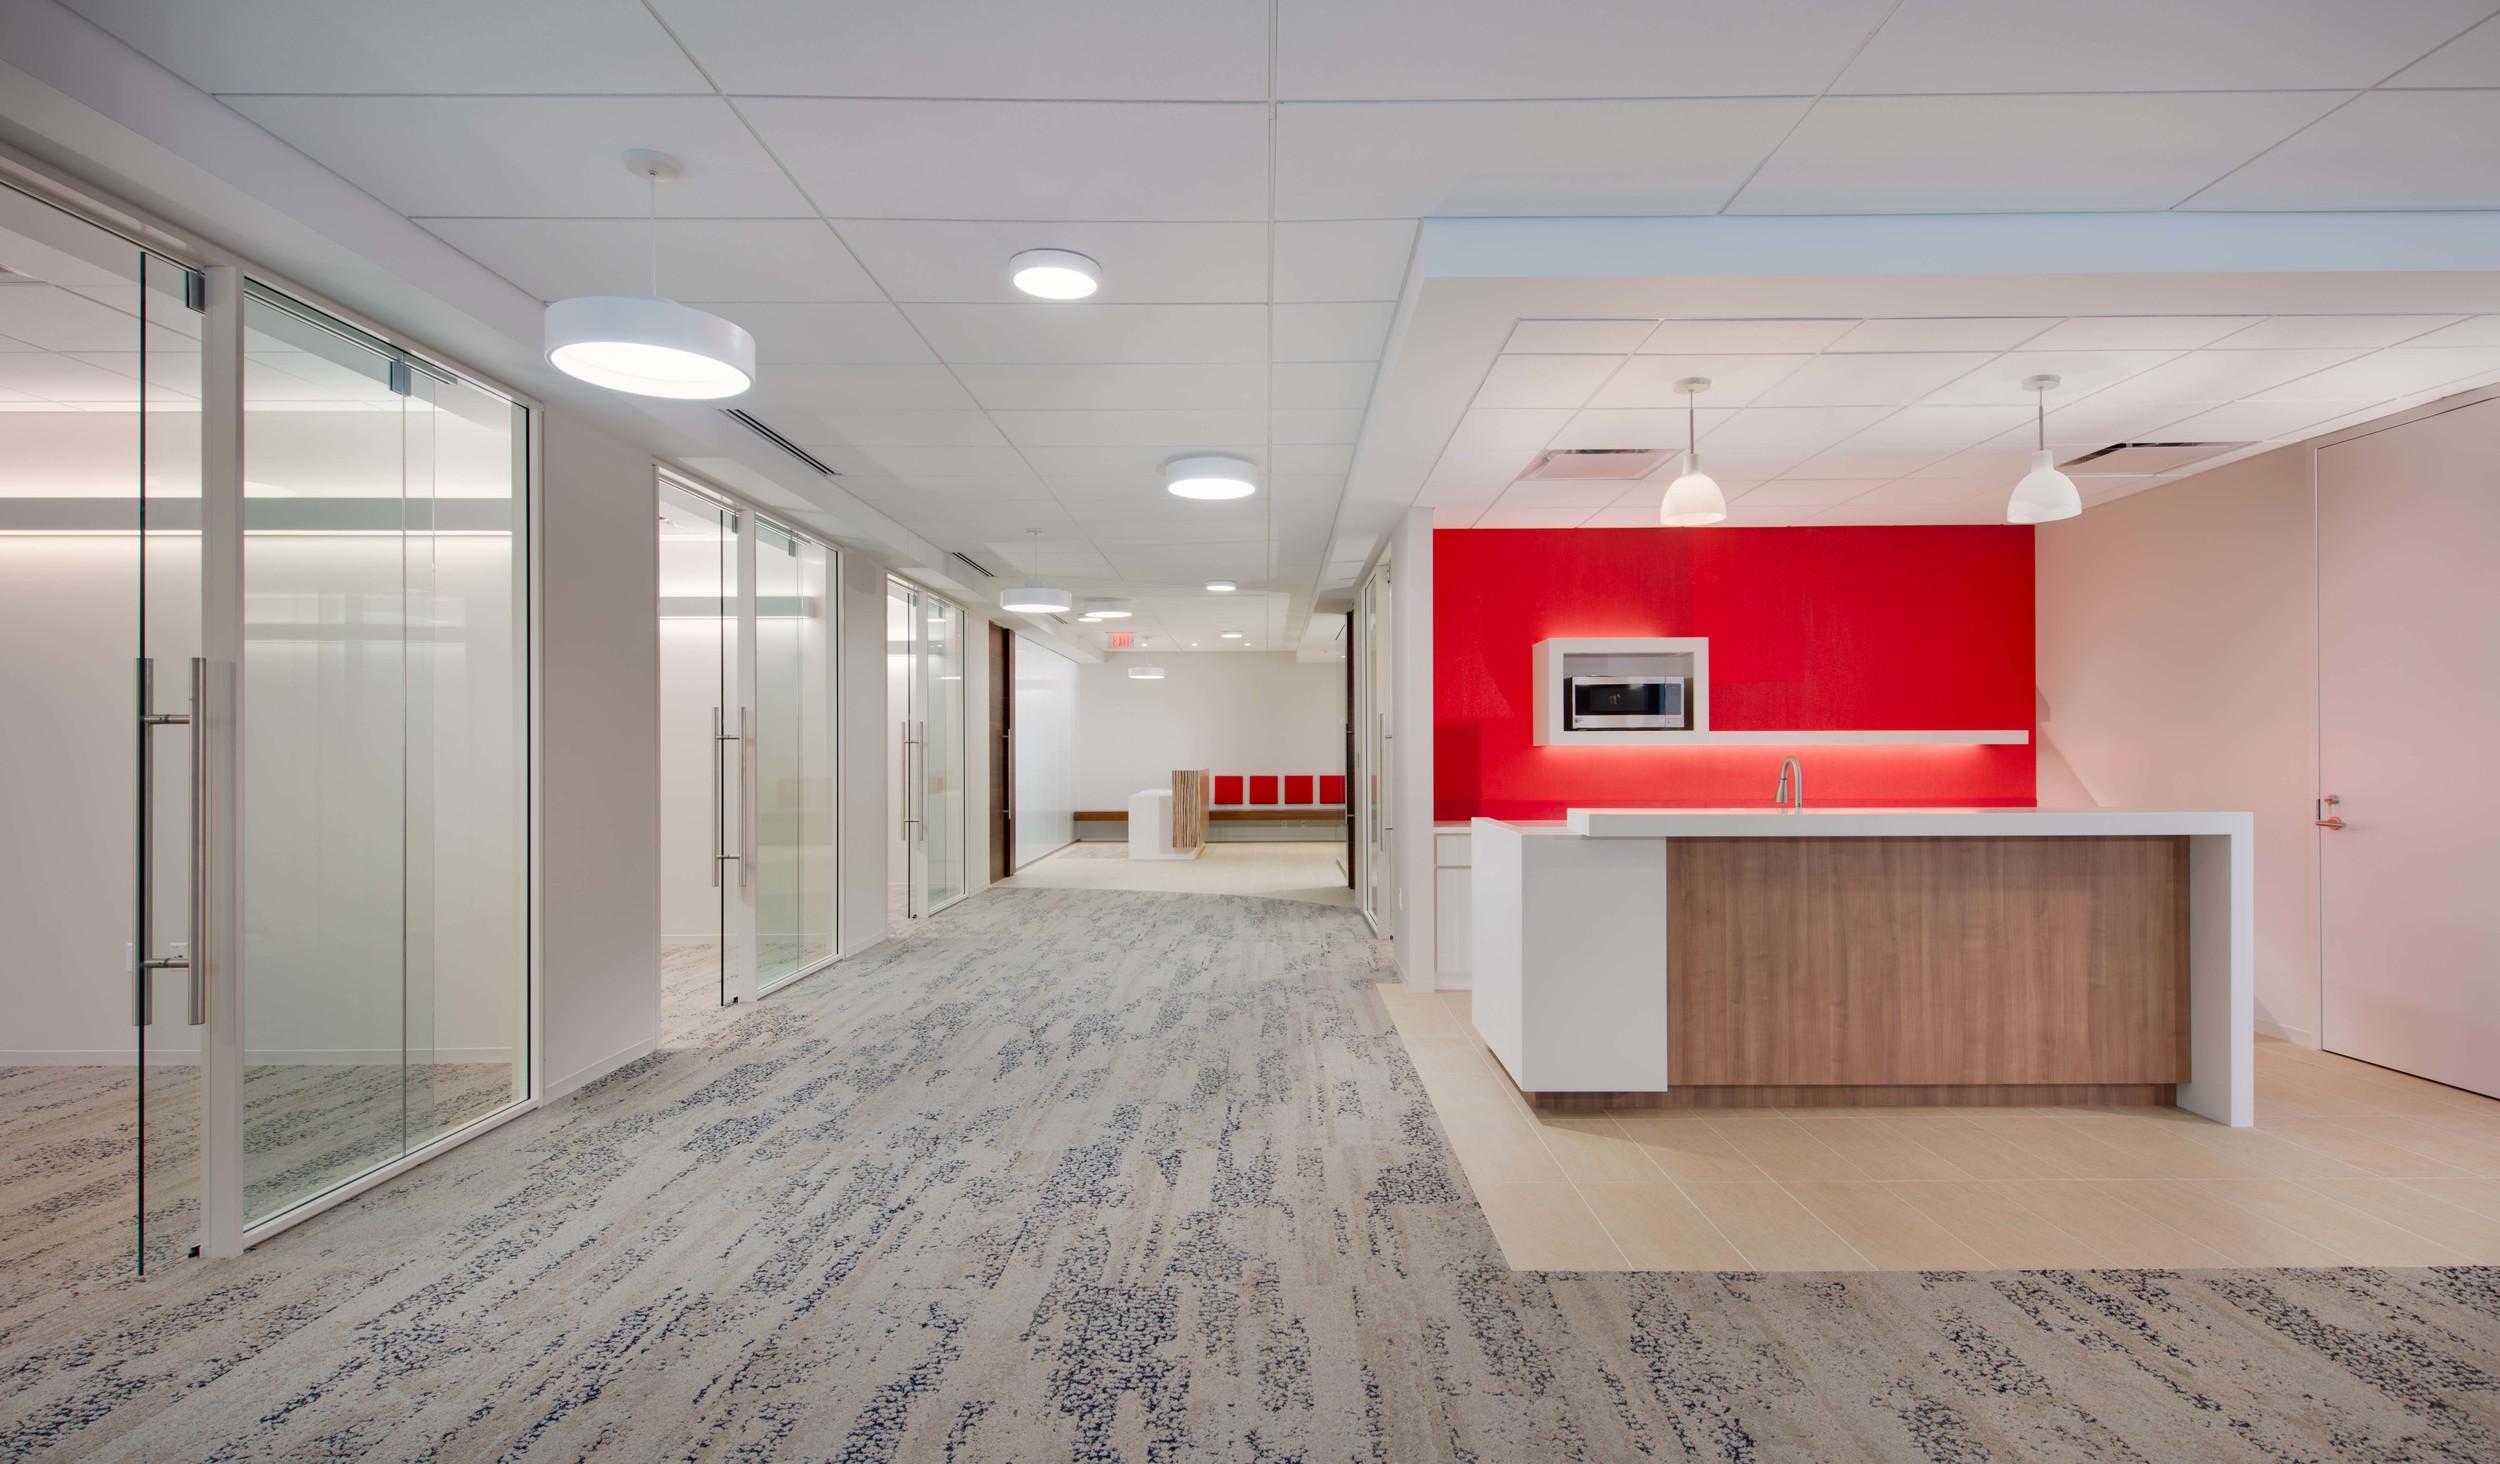 1200 17th Office Suite Interior Image 216547.jpg